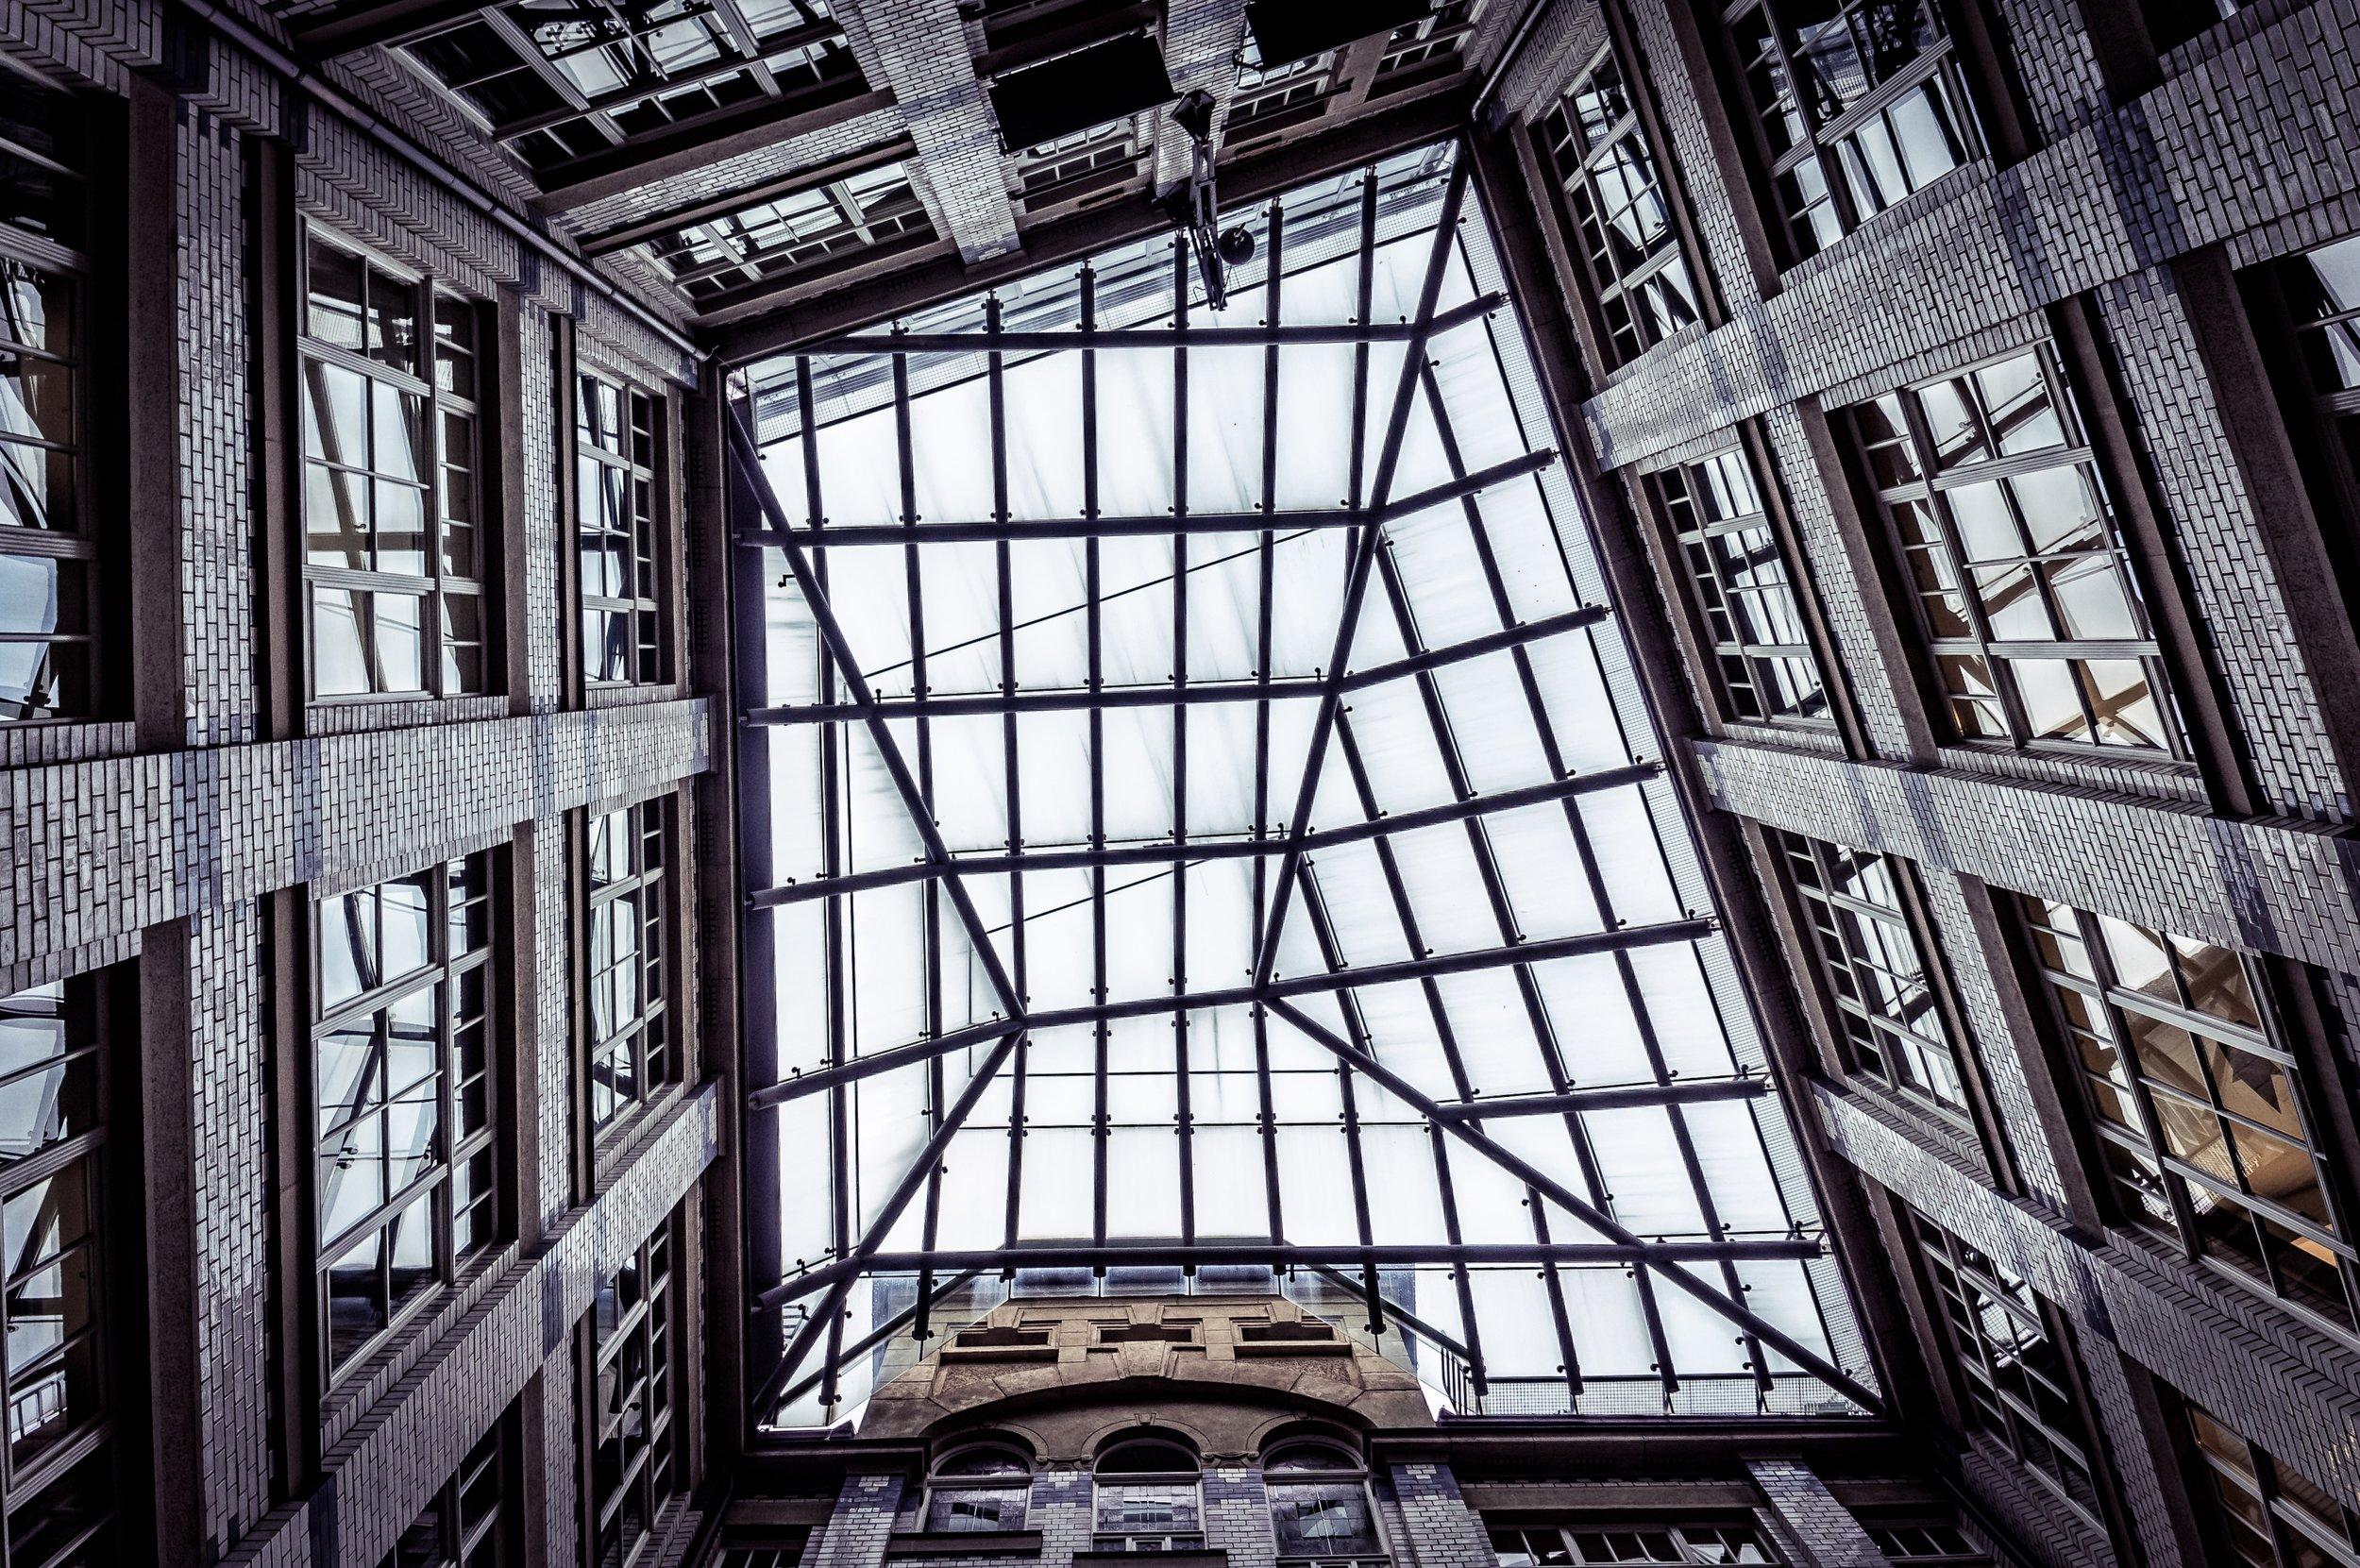 BREAKABLE… - Photo by  Patrick Baum  on  Unsplash